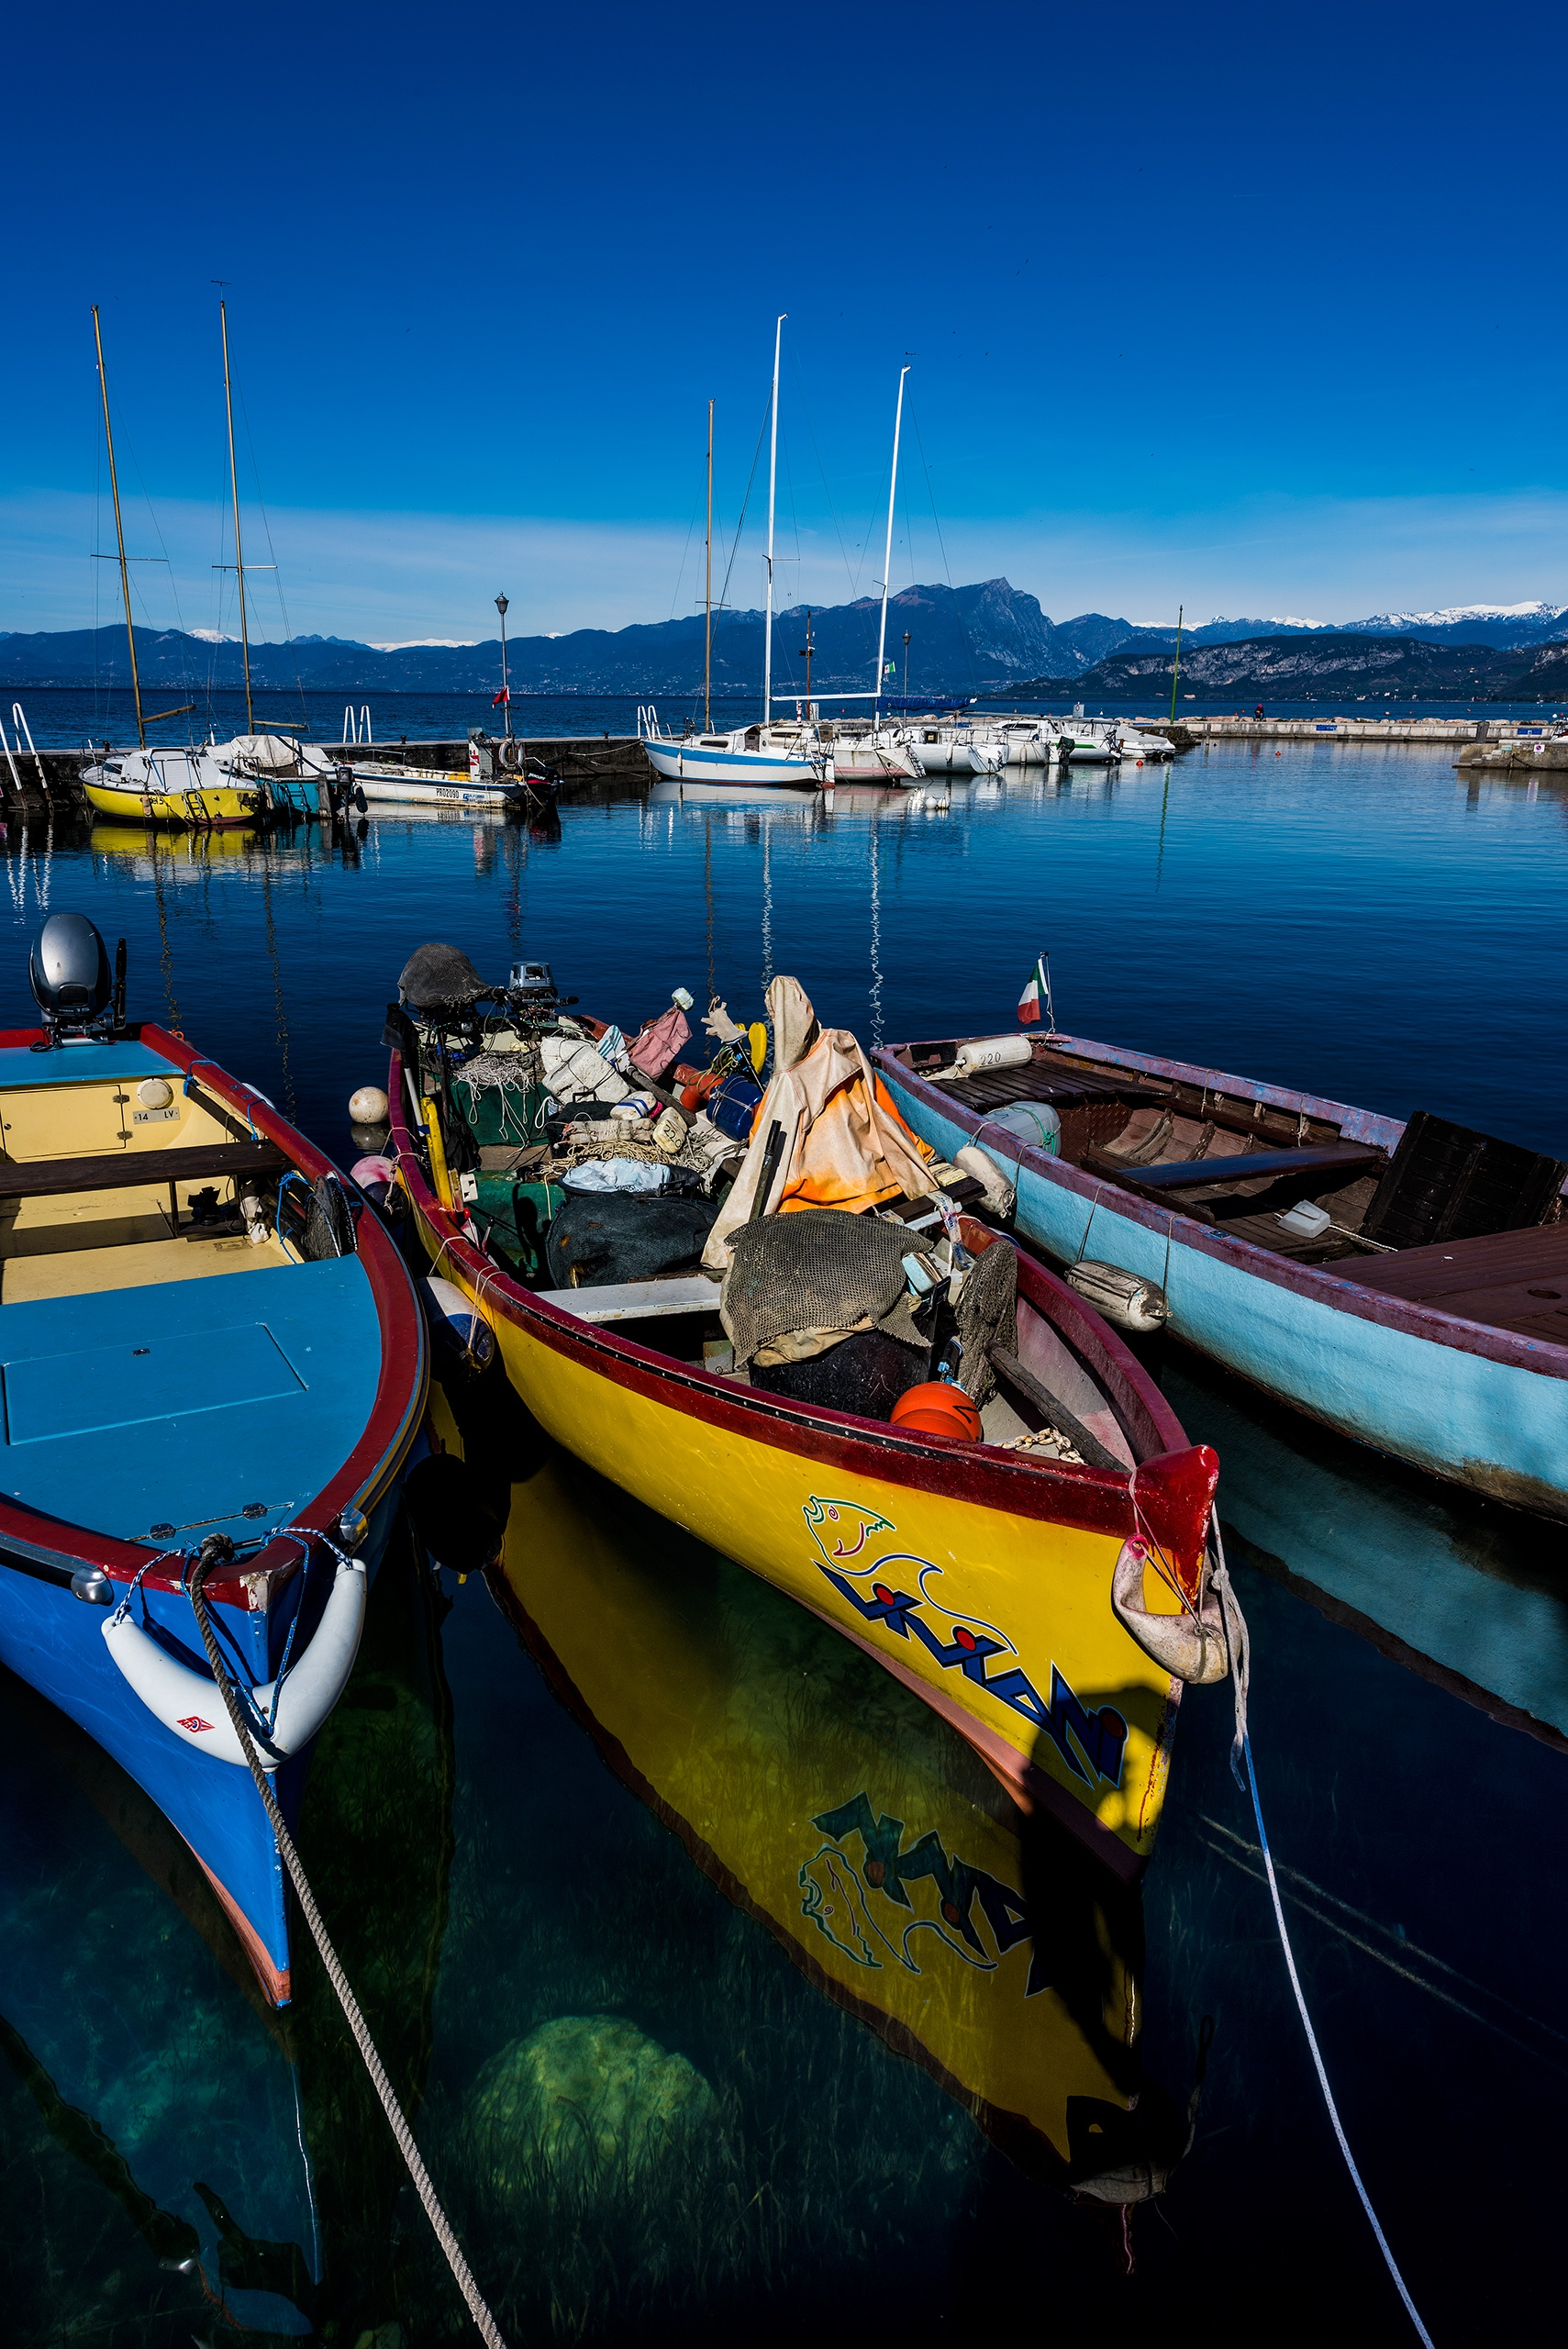 skilled boat - Lazise - christofkessemeier | ello